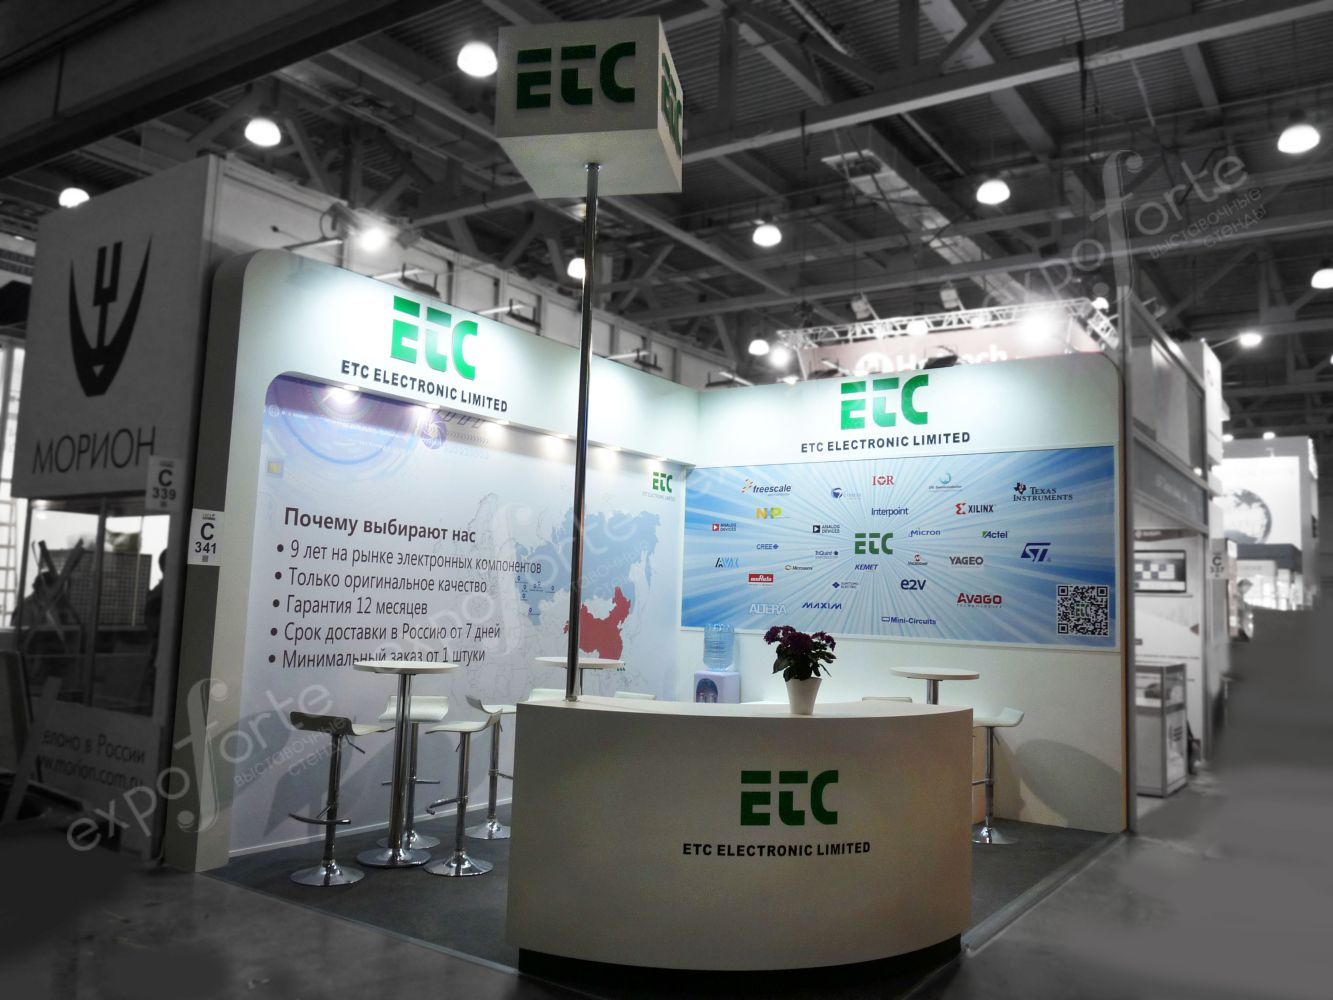 Фото: ETC, выставка ЭкспоЭлектроника – картинка 1